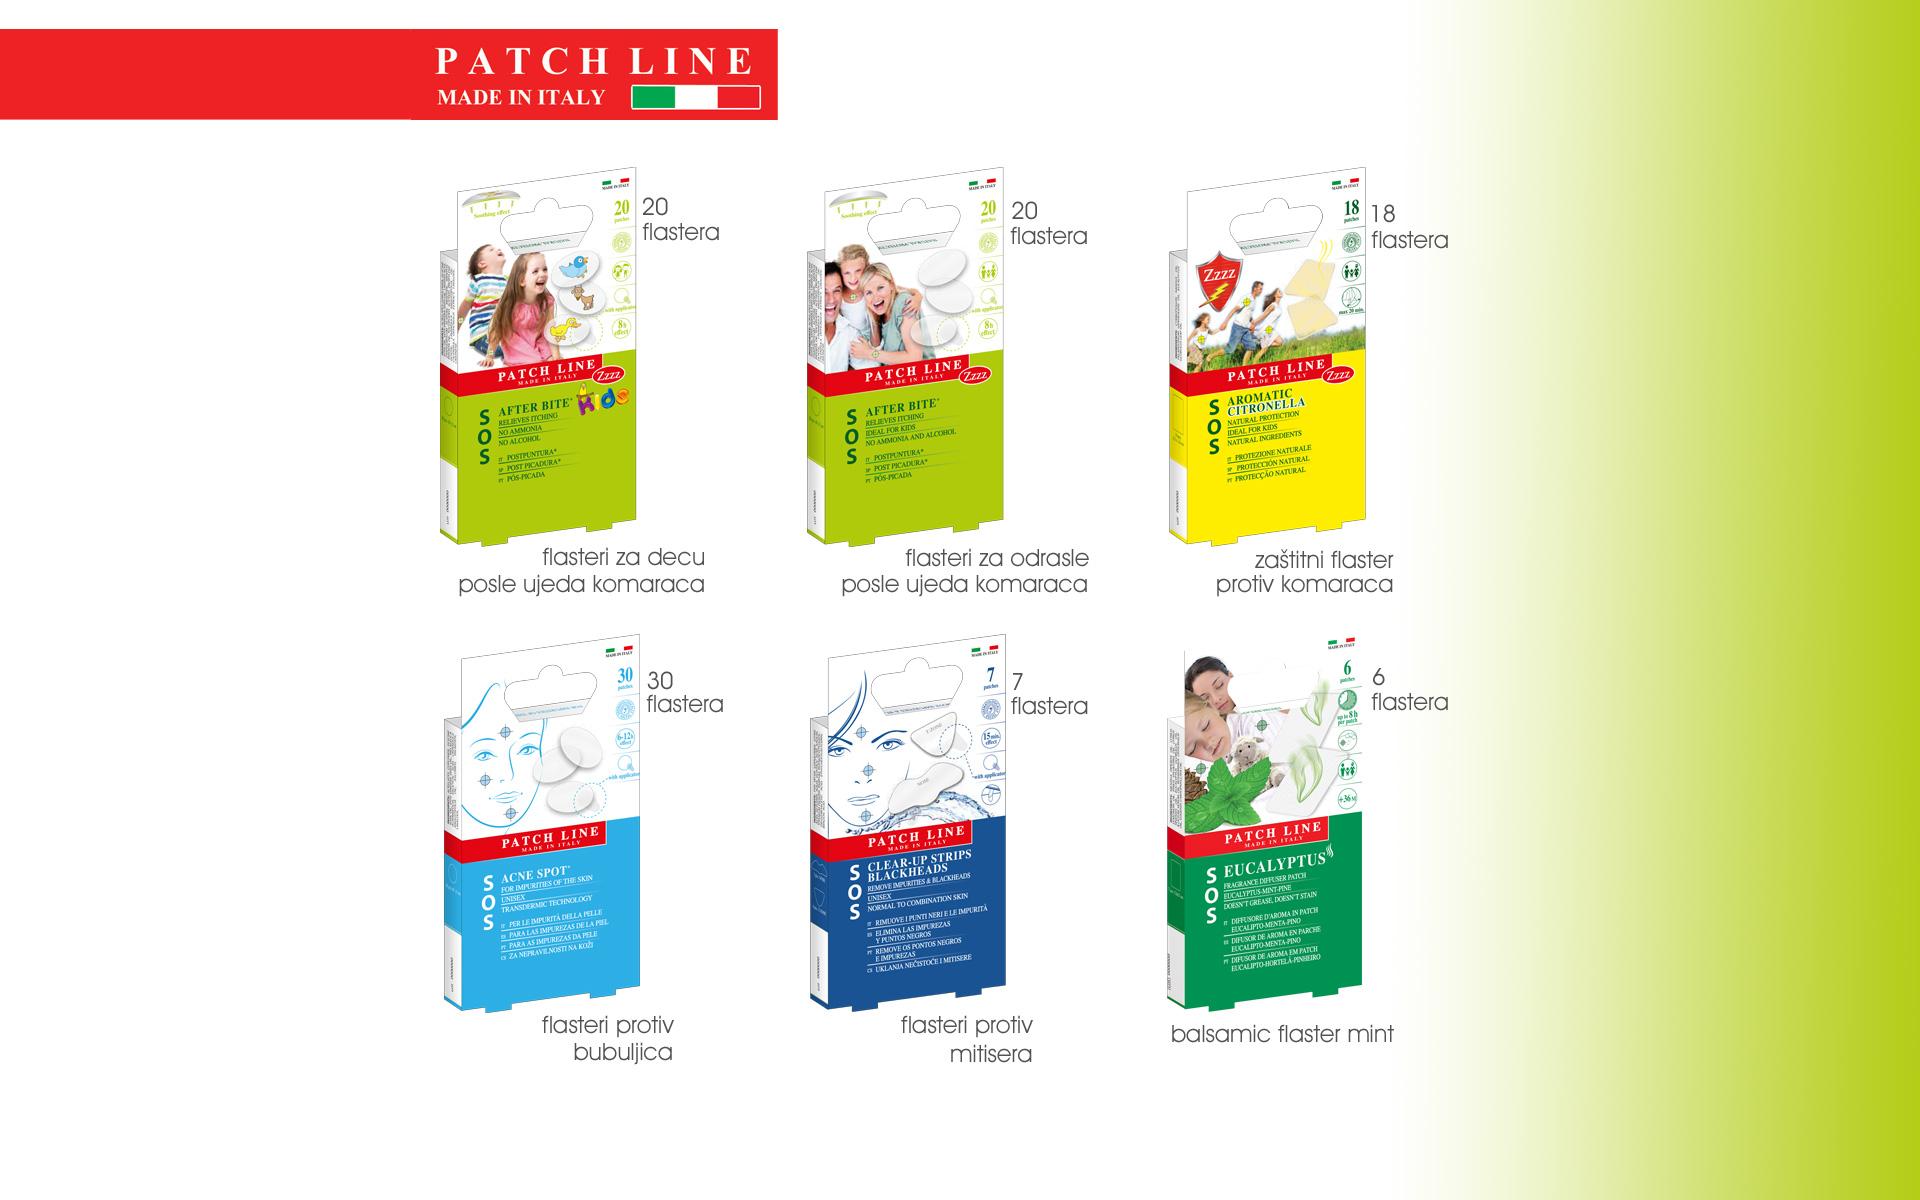 patch_line_kolekcija